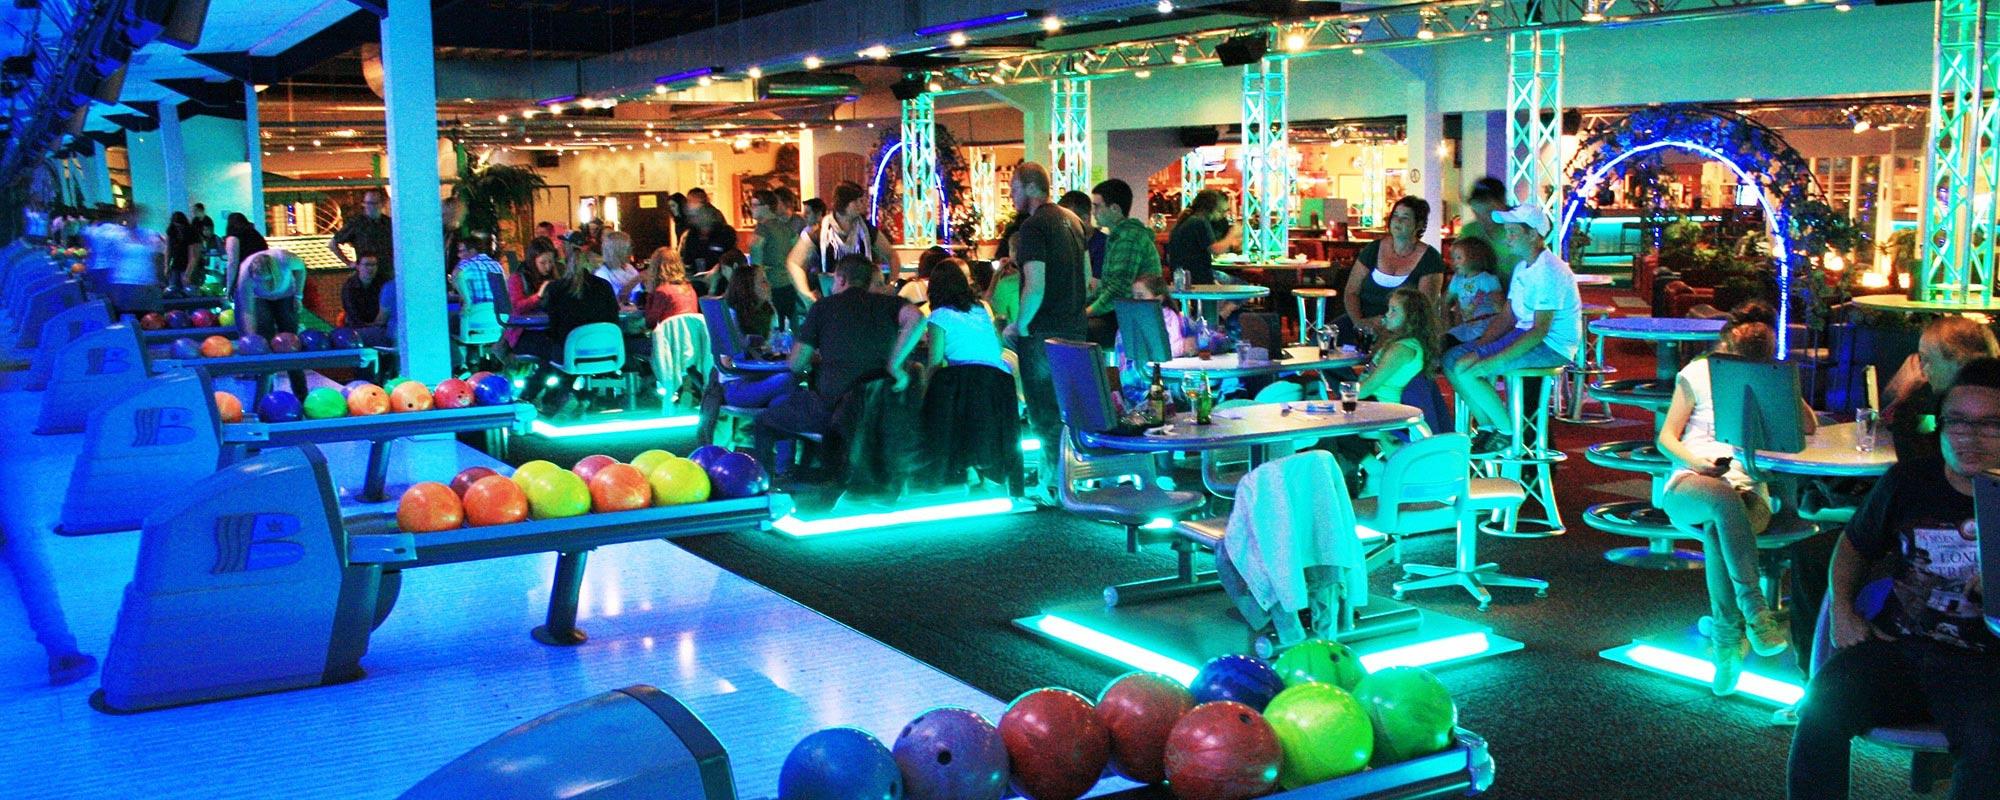 ebafkc-bowling-2000x800-02